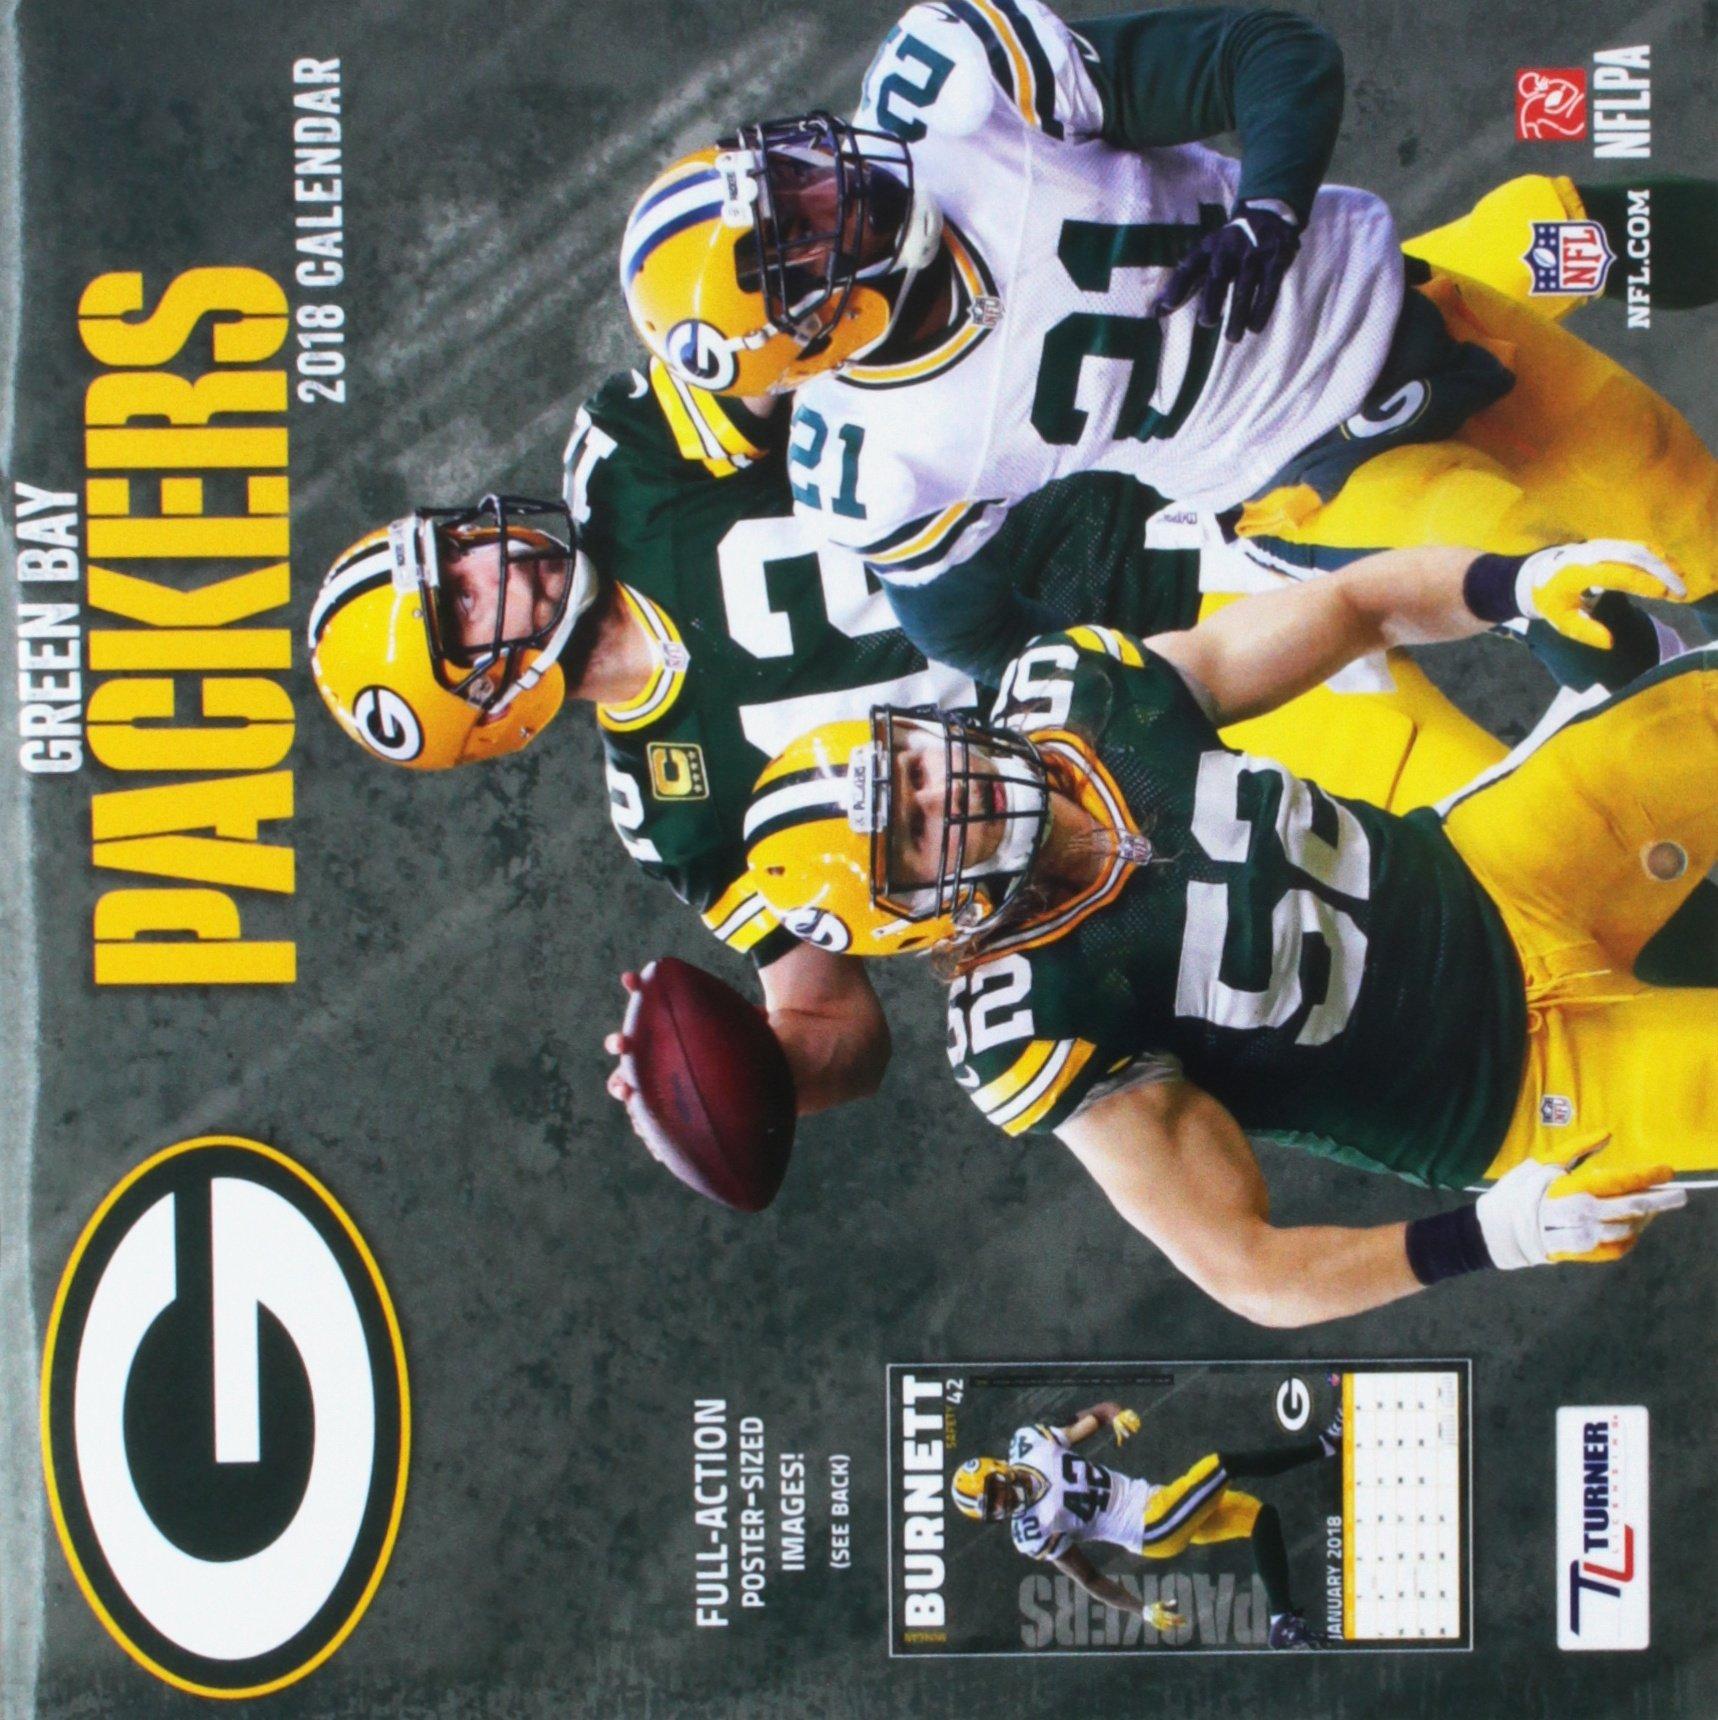 Inc Companies Amazon Bay Lang com Green Books 2018 9781469349053 Calendar Packers